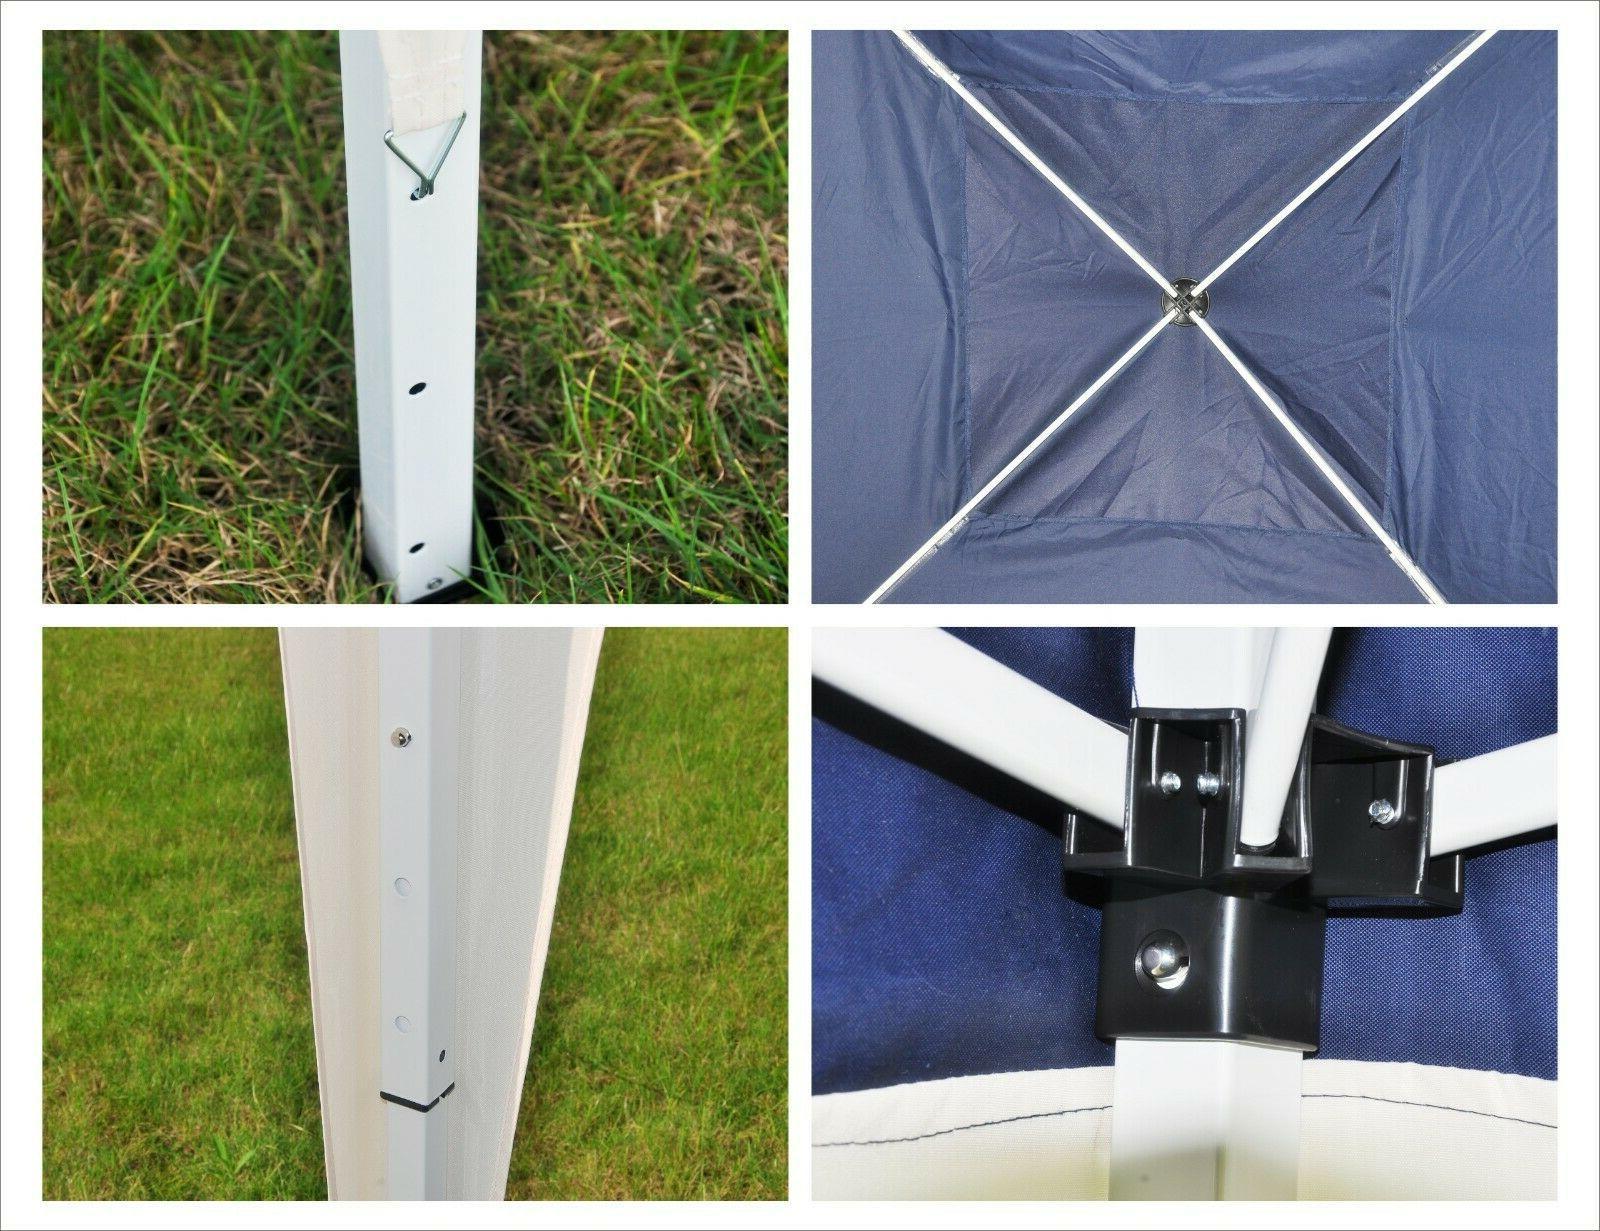 10x10 Canopy Tent Gazebo Outdoor Shelter W/